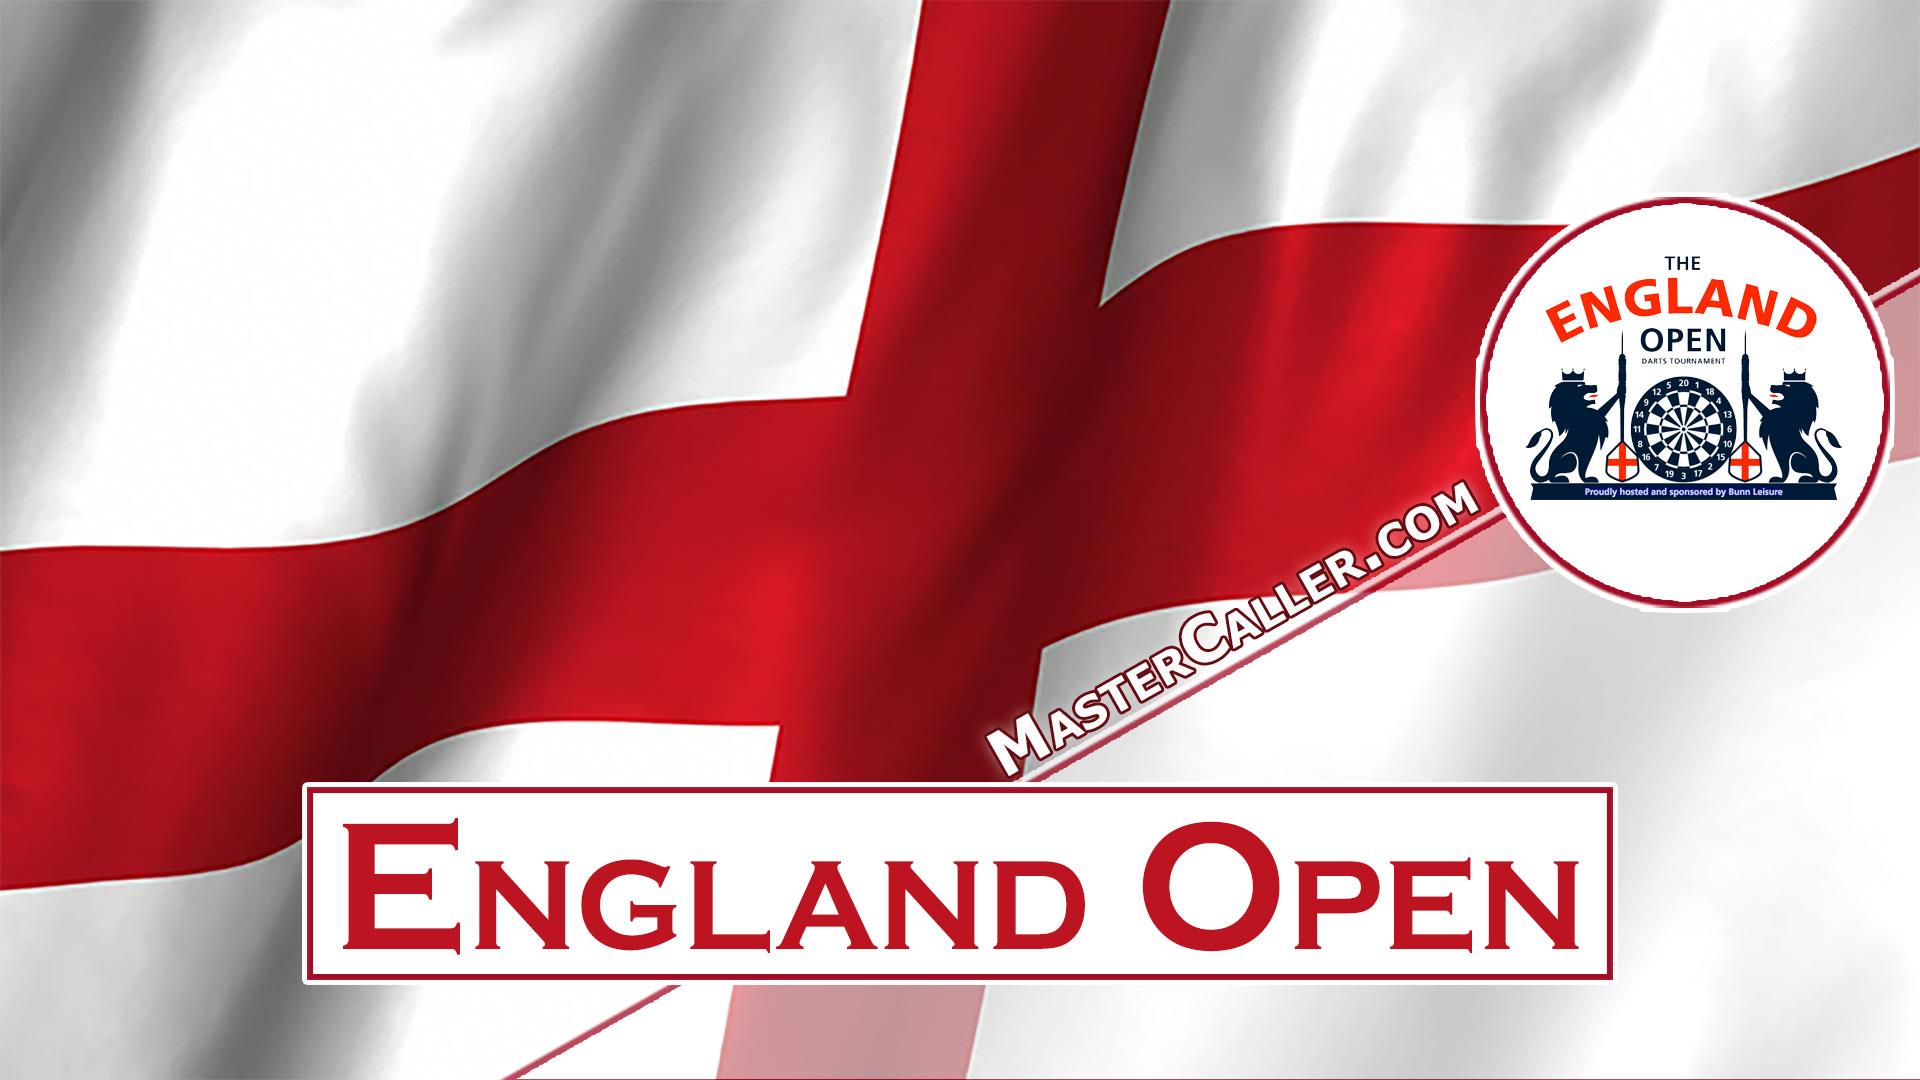 England Open Girls - 2021 Logo